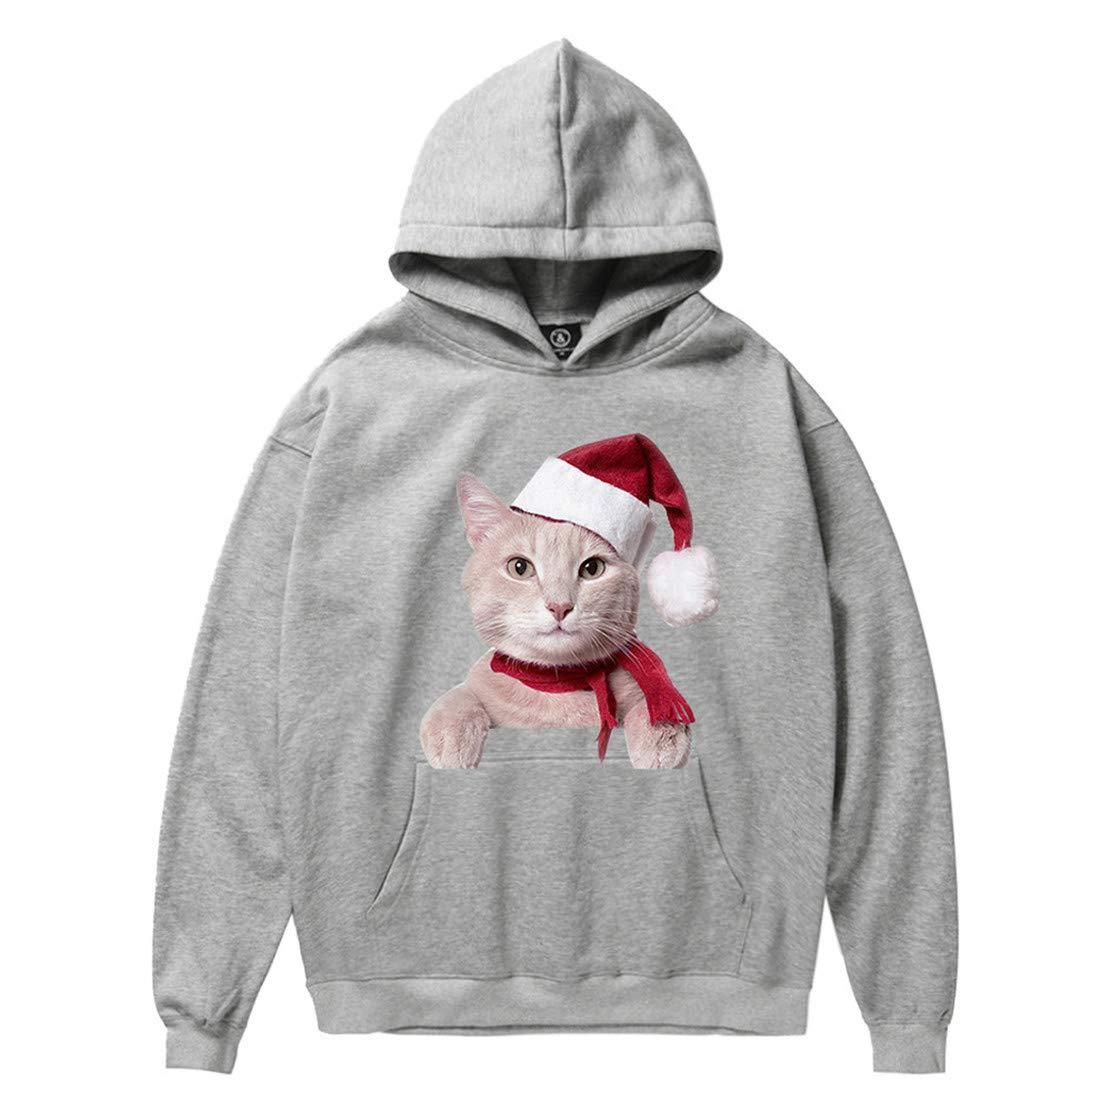 Mikey Store Men Woman Winter Christmas Cat Print Long Sleeve Hooded Sweatshirt Tops